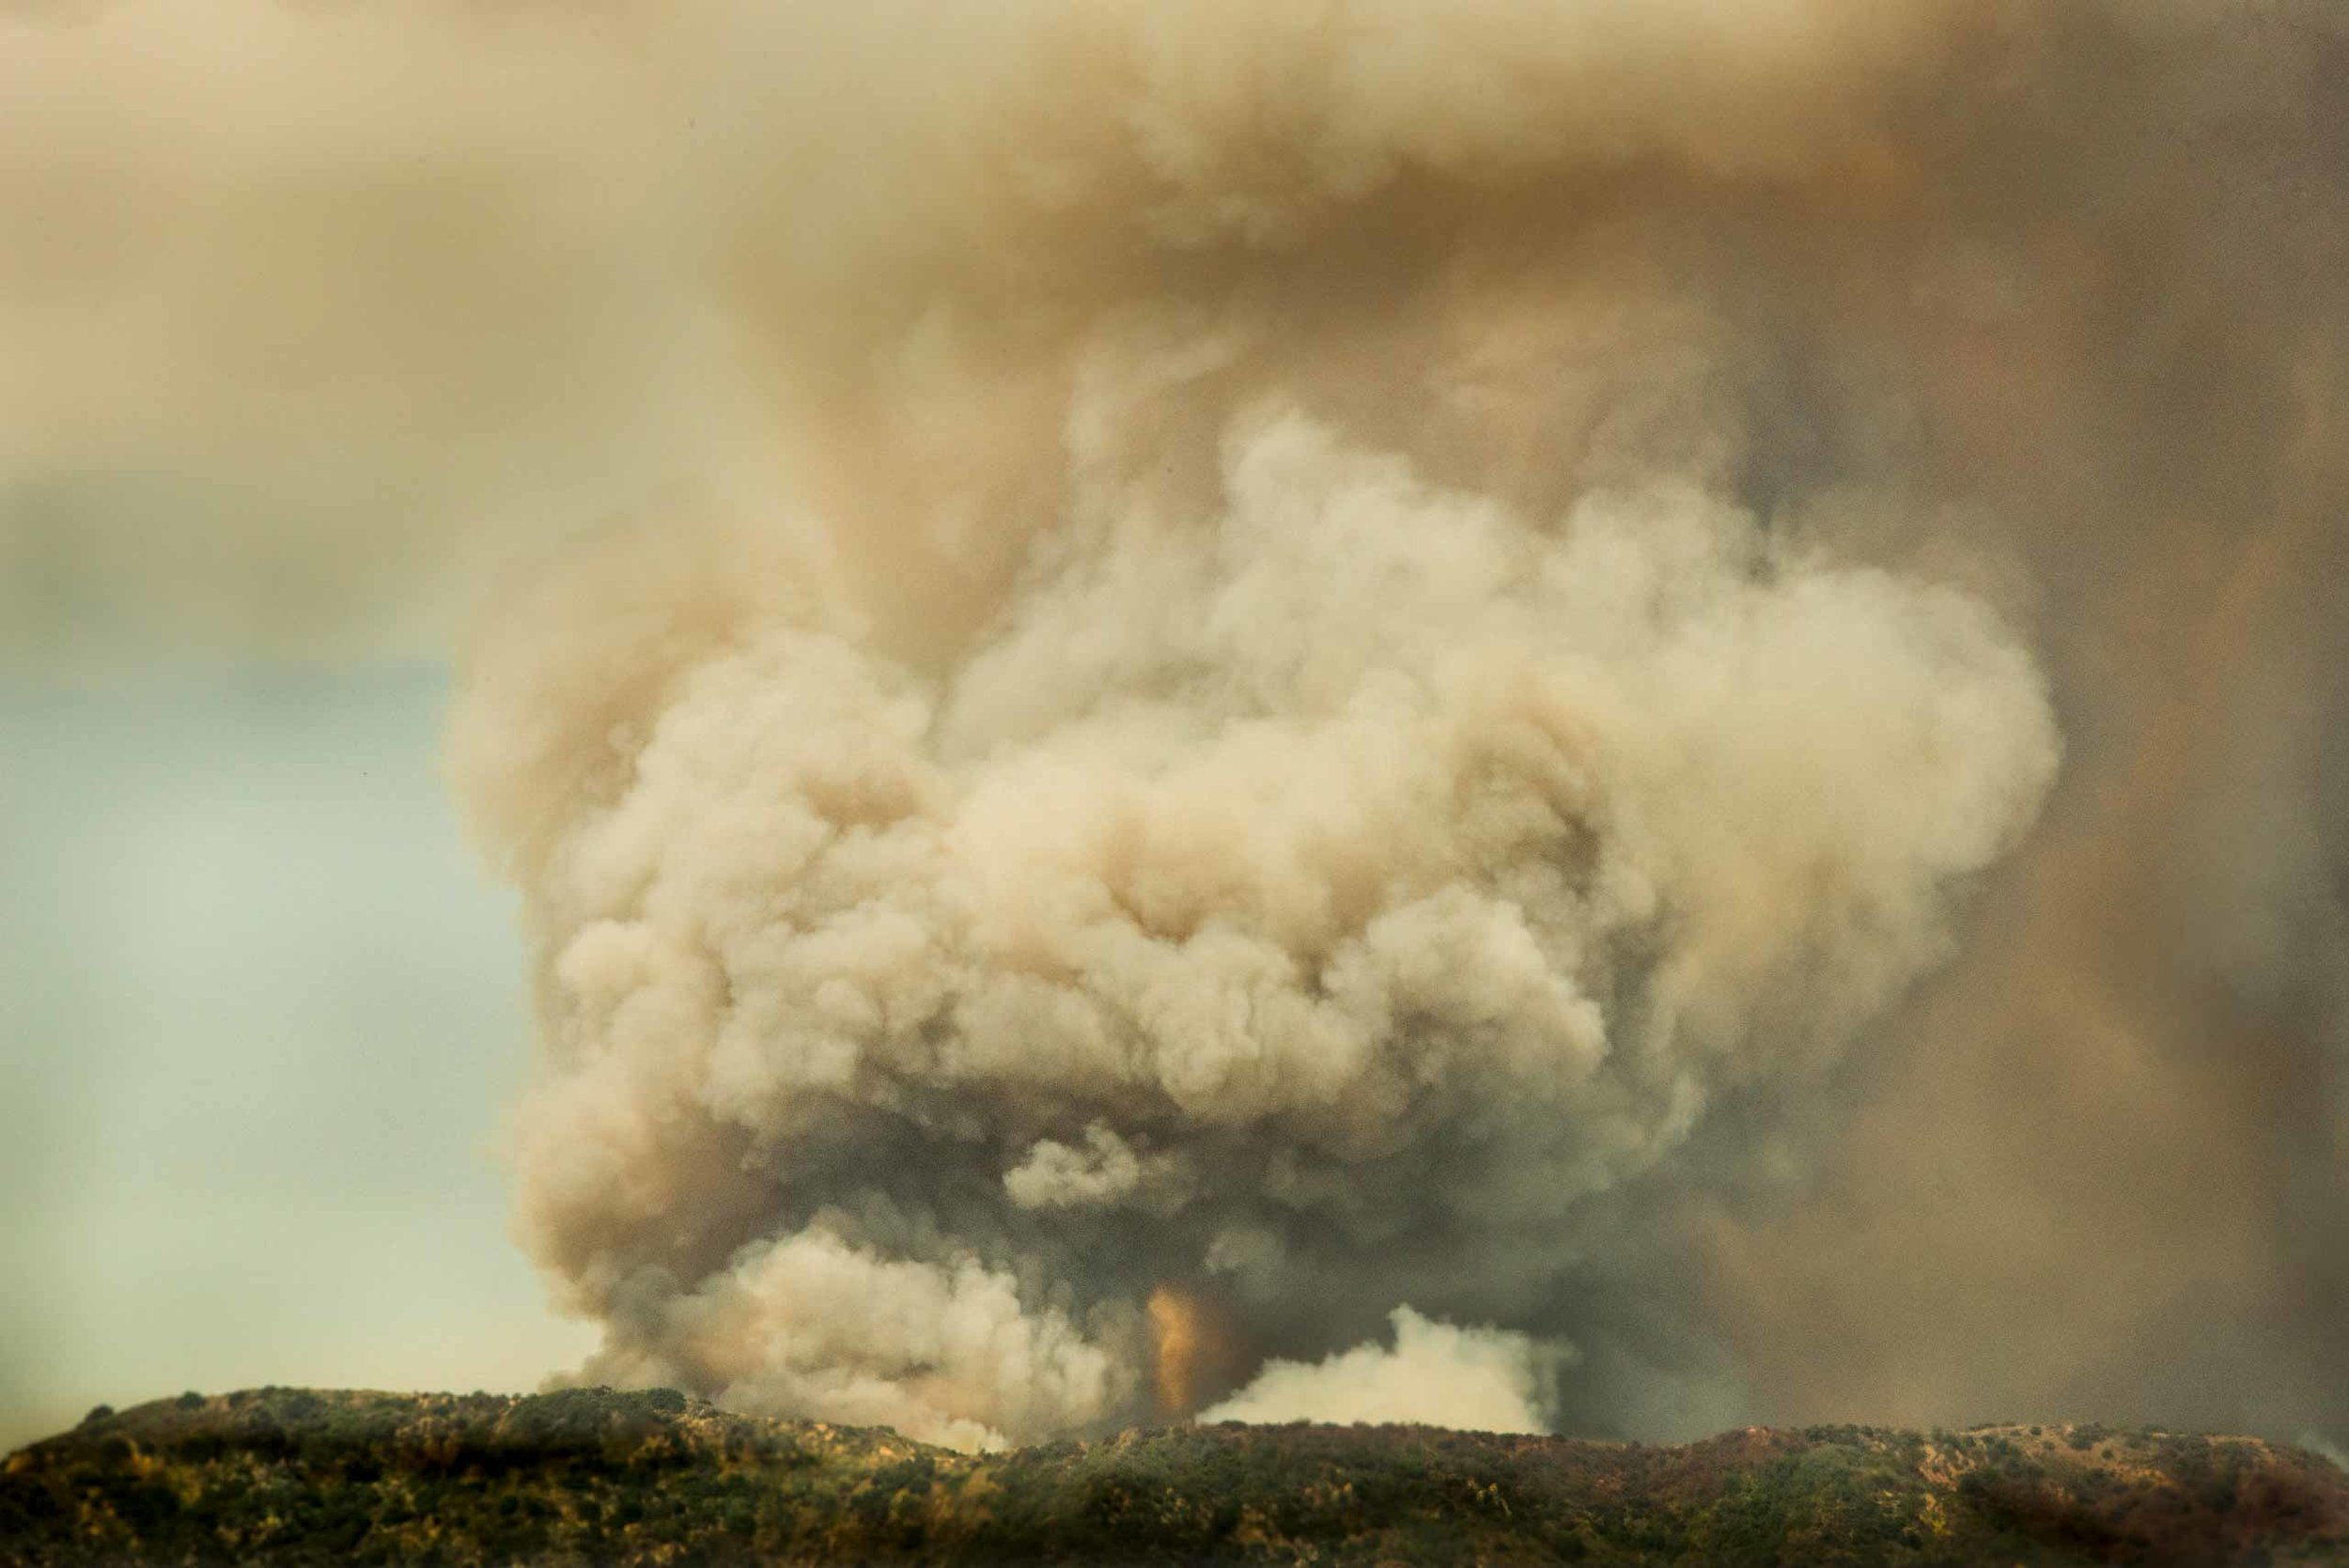 Fire on Hill, Monrovia, California, 2016